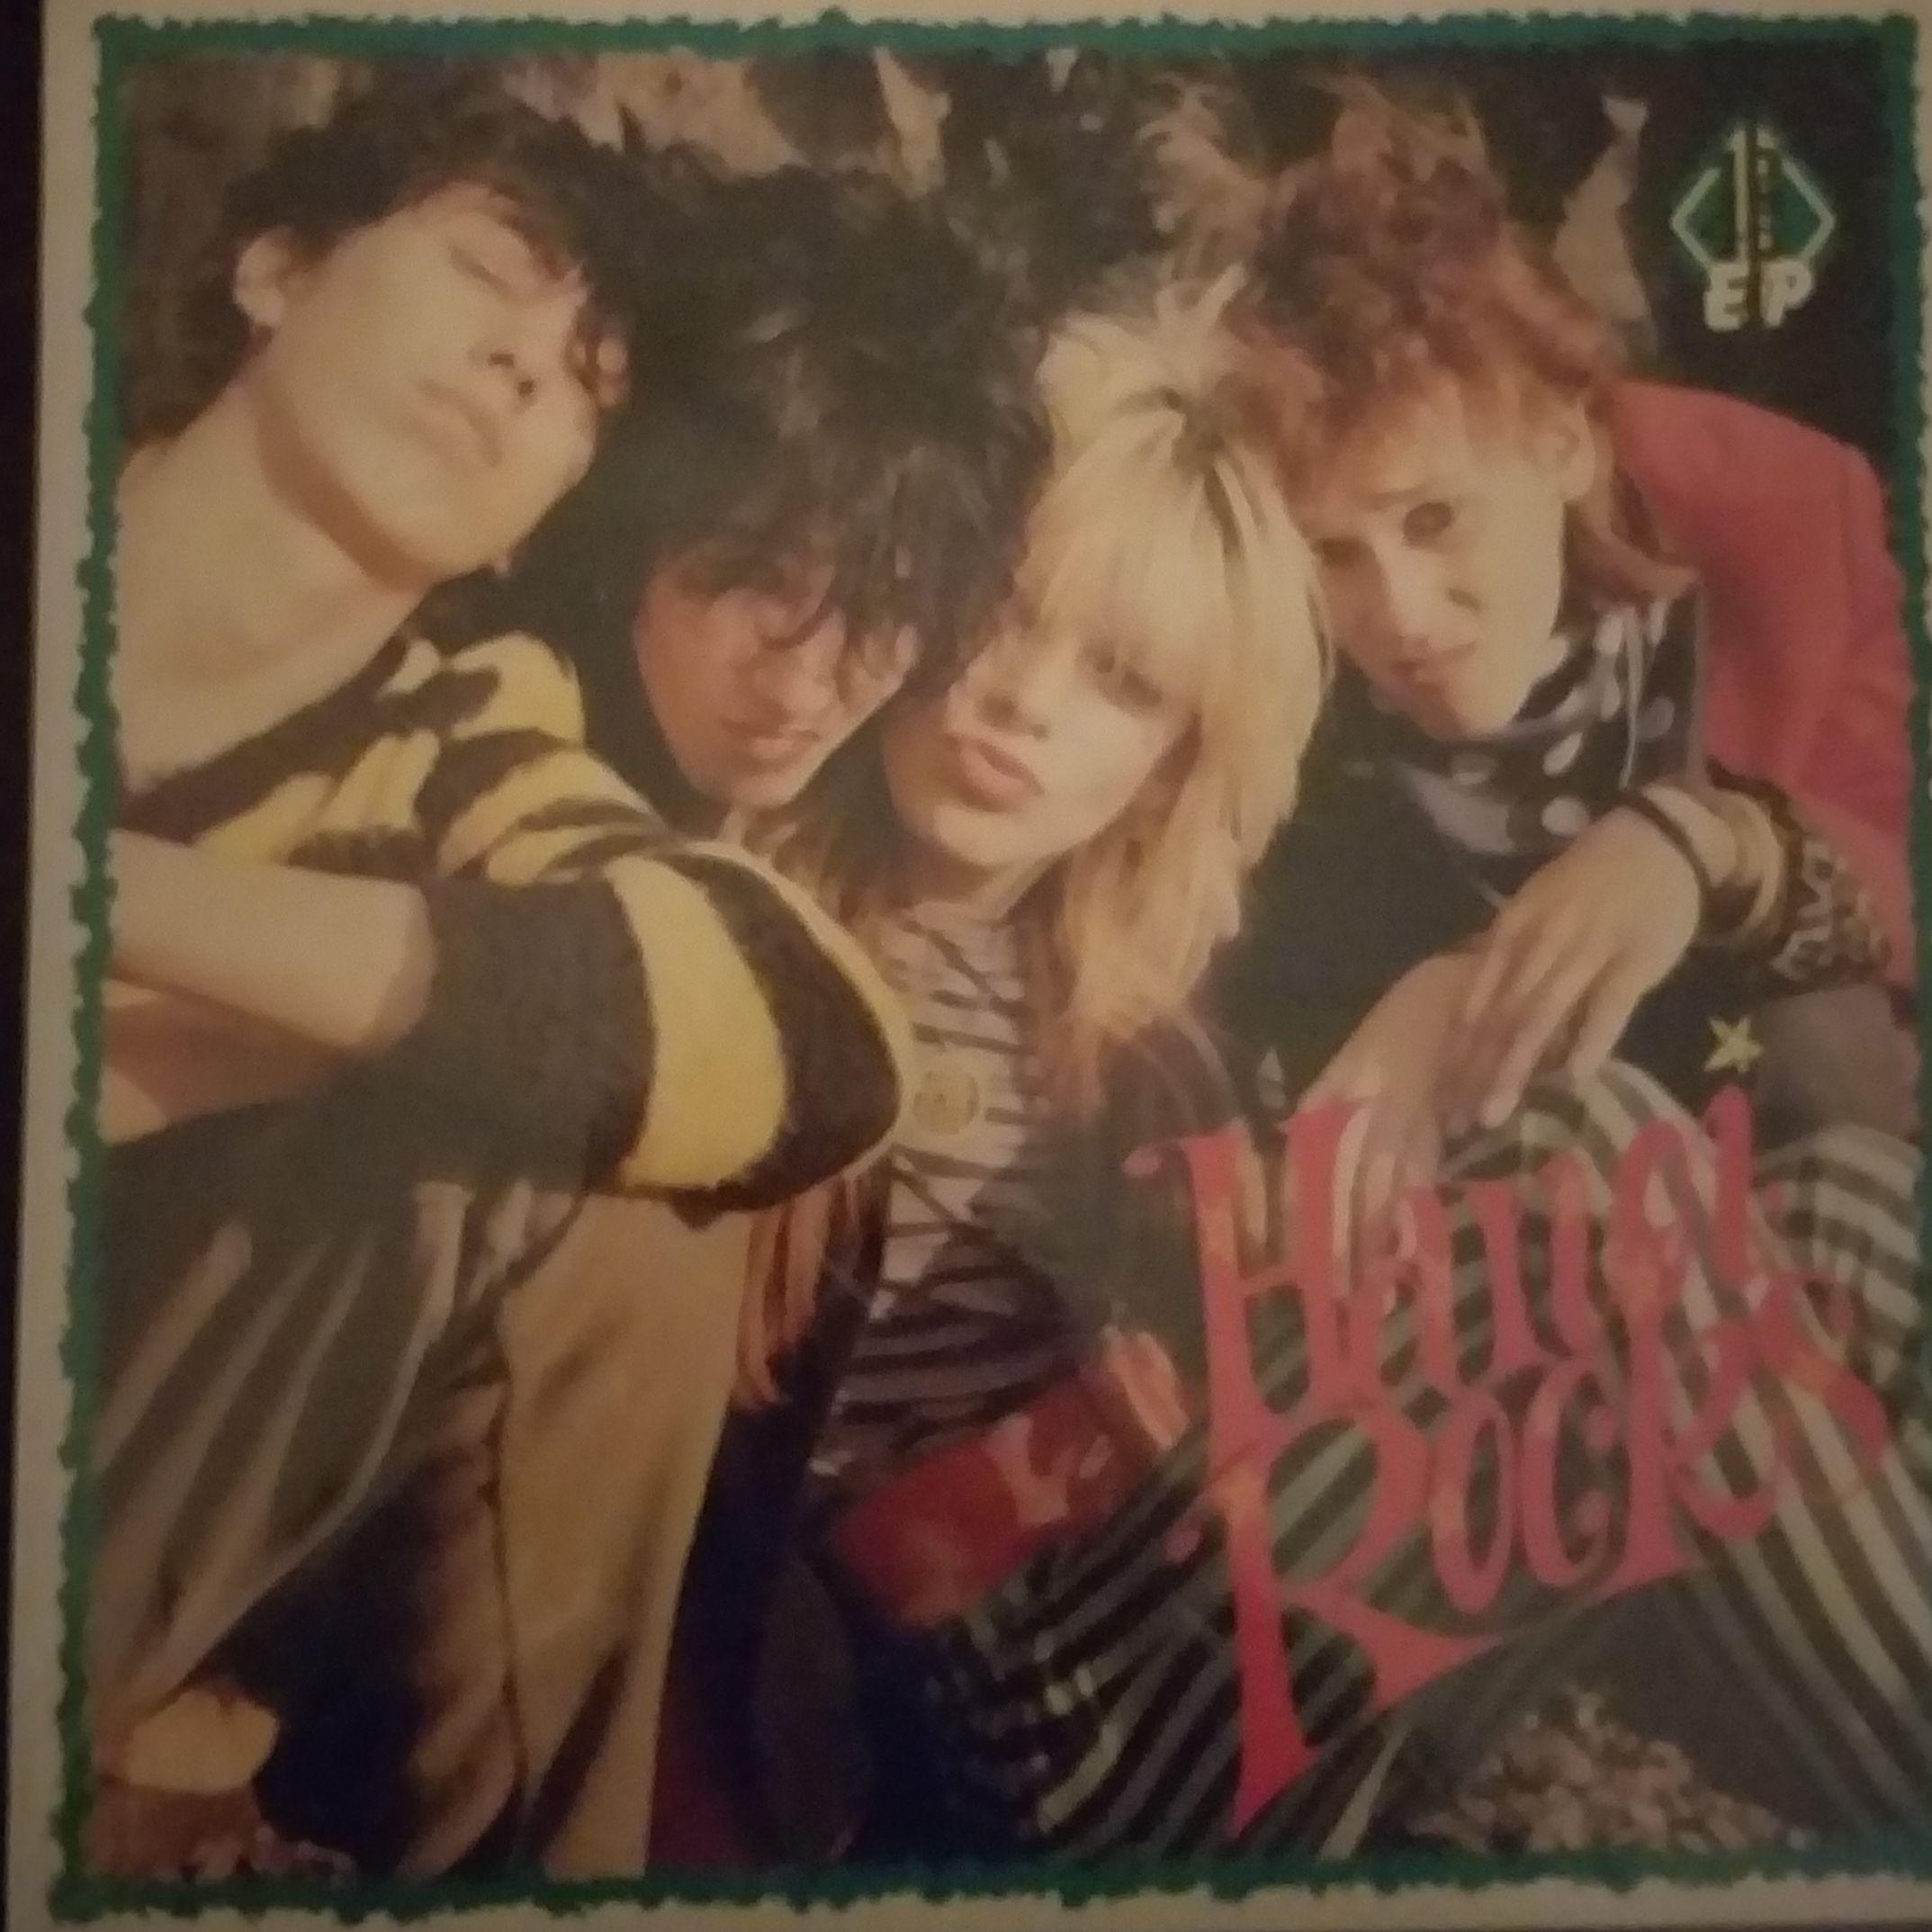 "Hanoi rocks ""Venue ep"" LP undefined"